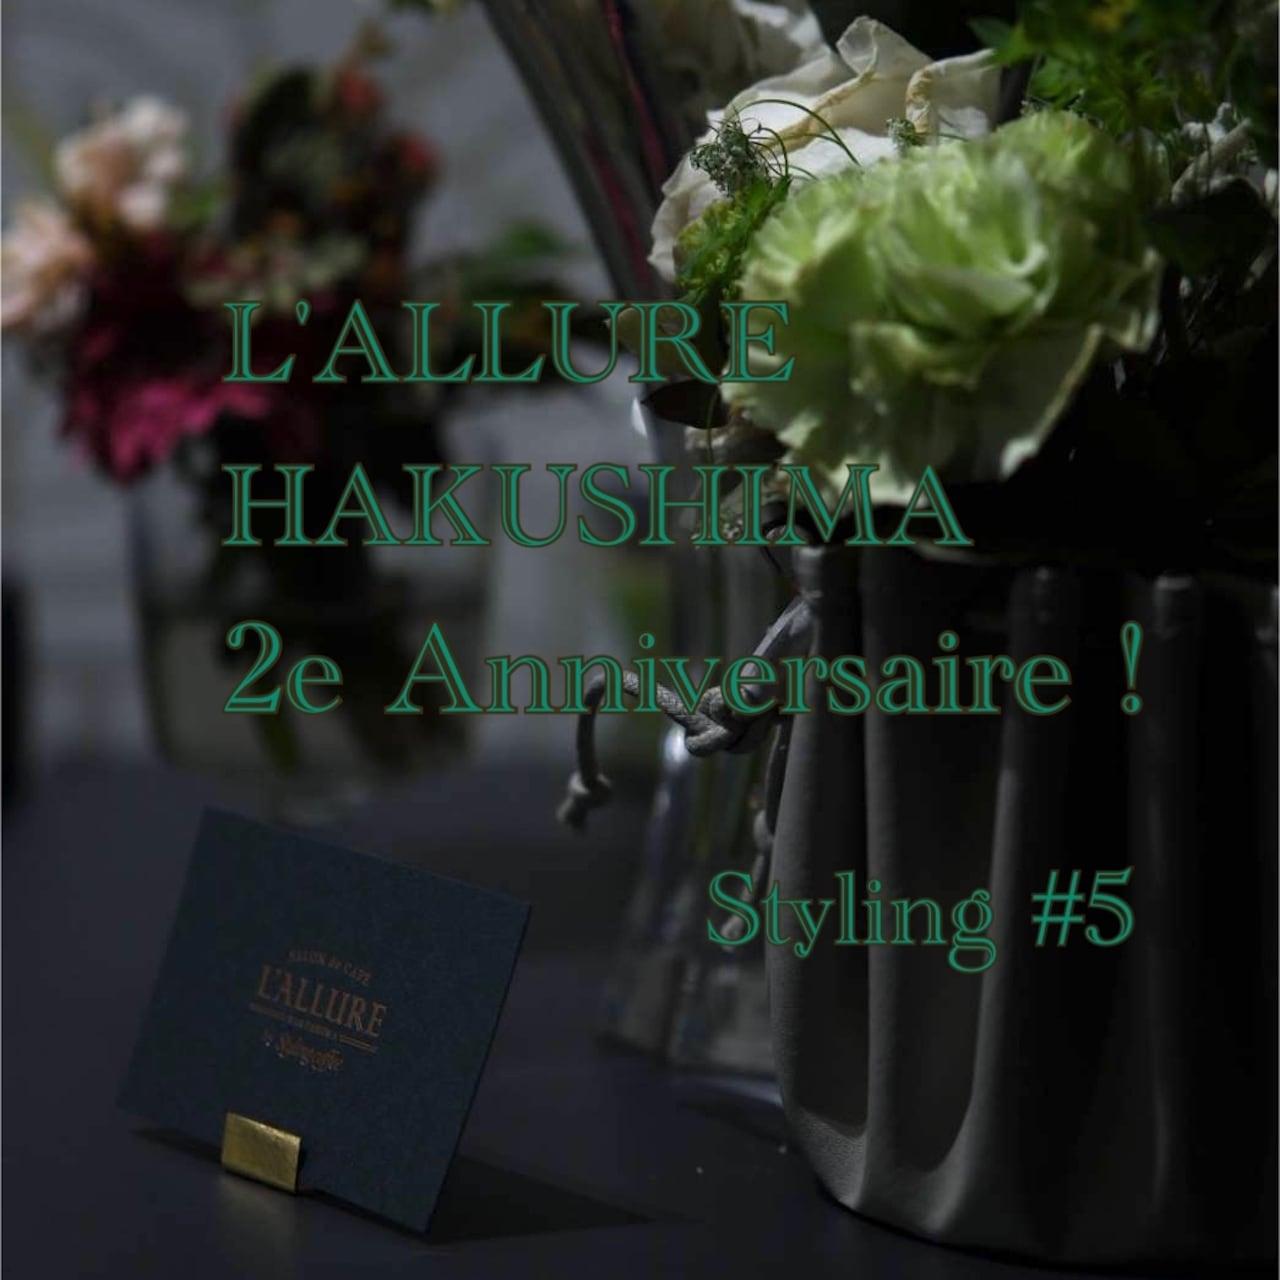 【 2e Anniversaire! #5 】手軽にはじめるコーヒーライフ♫ - 抽出器具セット4選 -